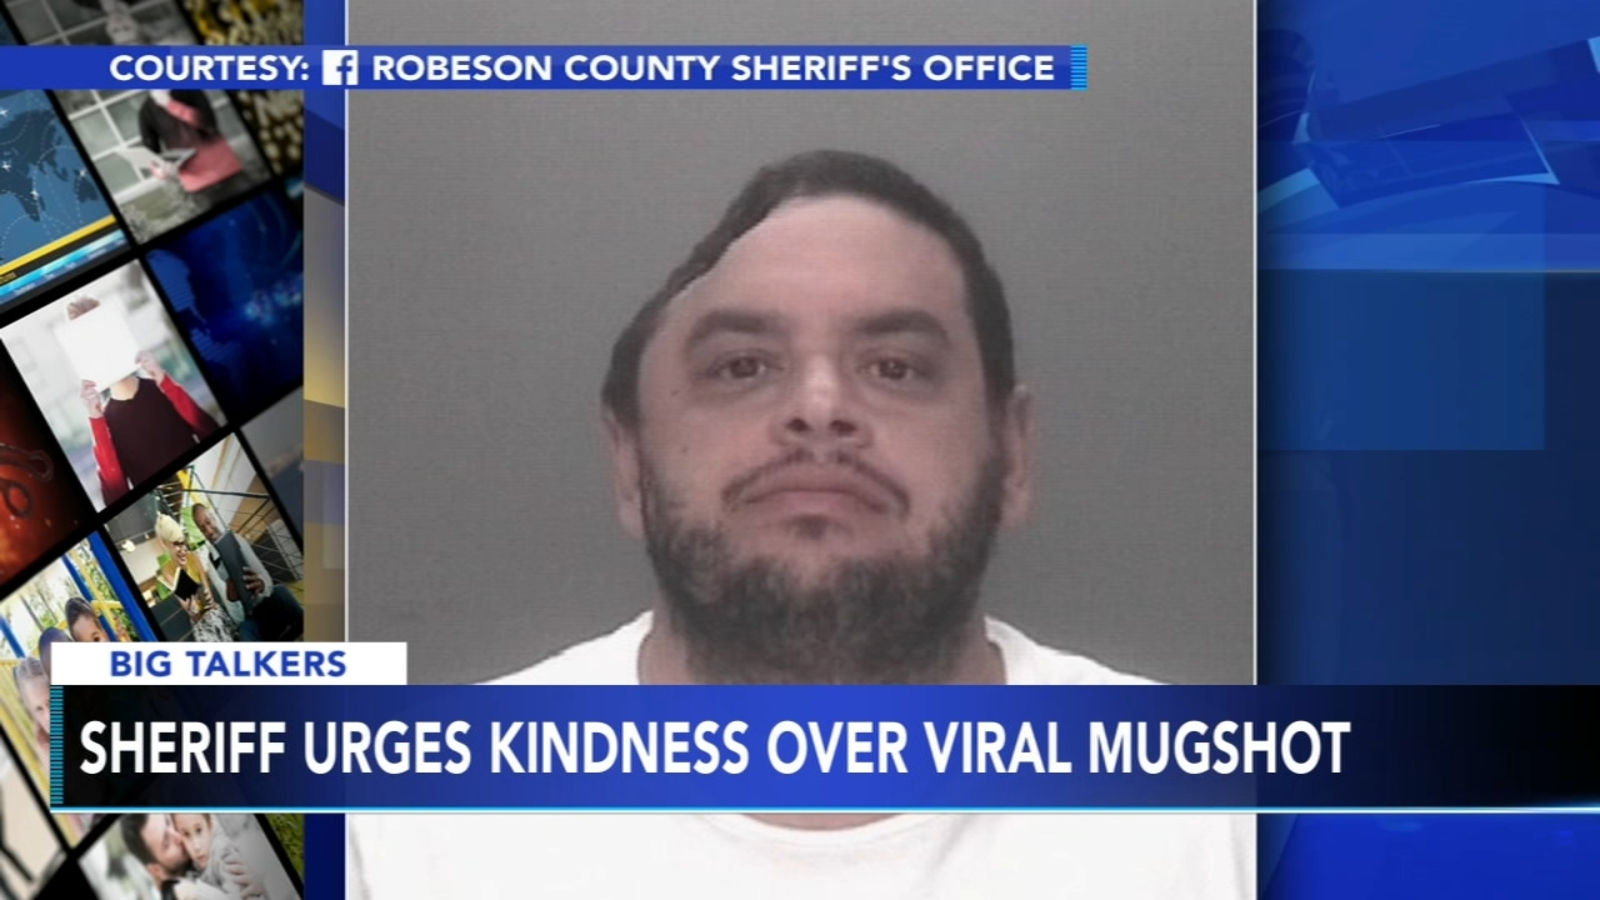 North Carolina police urge kindness over viral mugshot